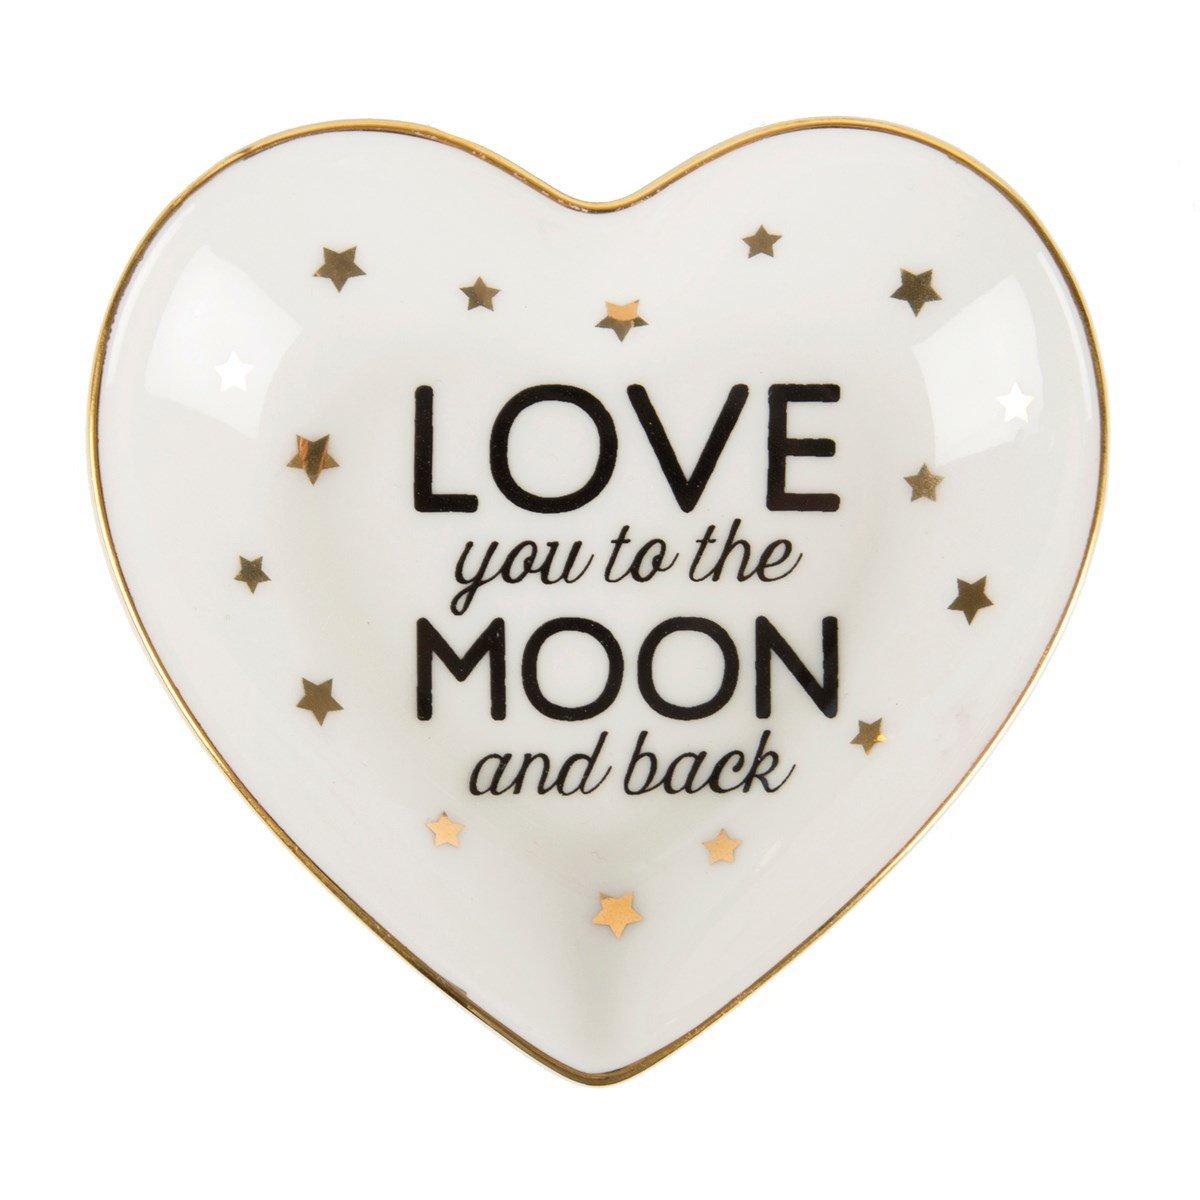 Porzellan Schmuckteller Love you to the moon and back mit goldenen Sternchen sass & belle CHIC006